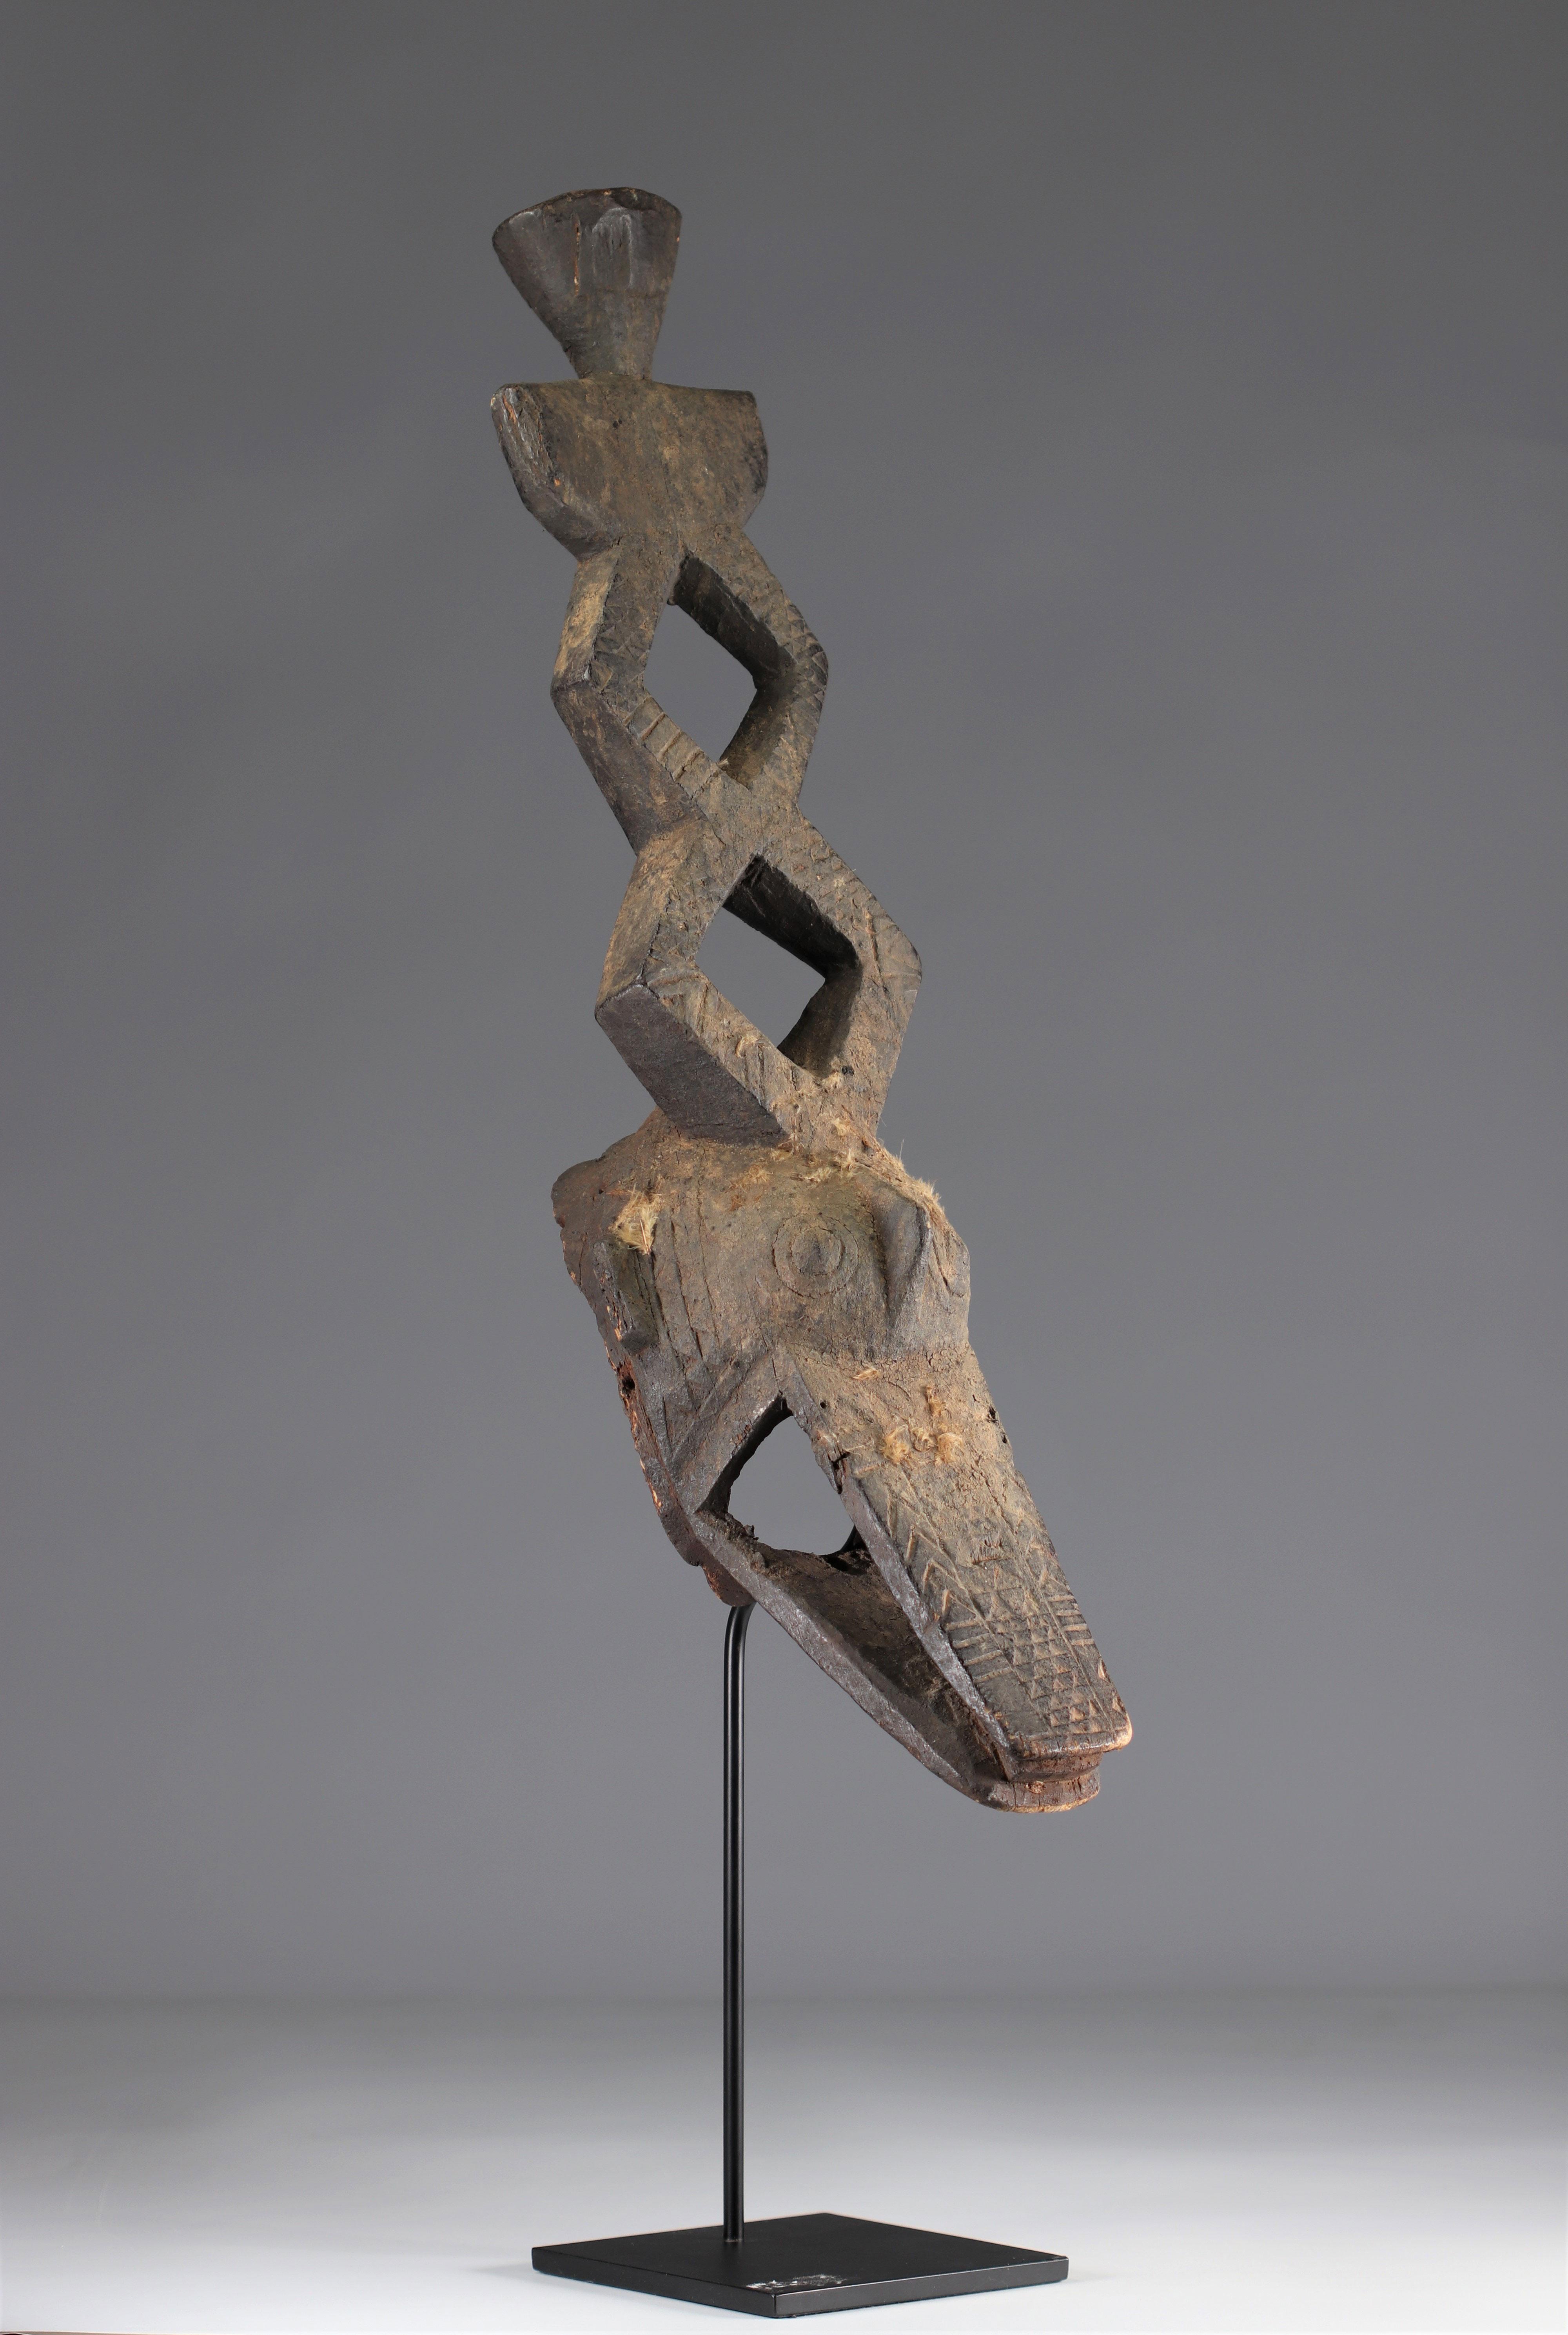 Ko Mask - Very old Ko caiman mask (Burkina Faso). Early 20th century. Very old black sacrificial pat - Image 3 of 5